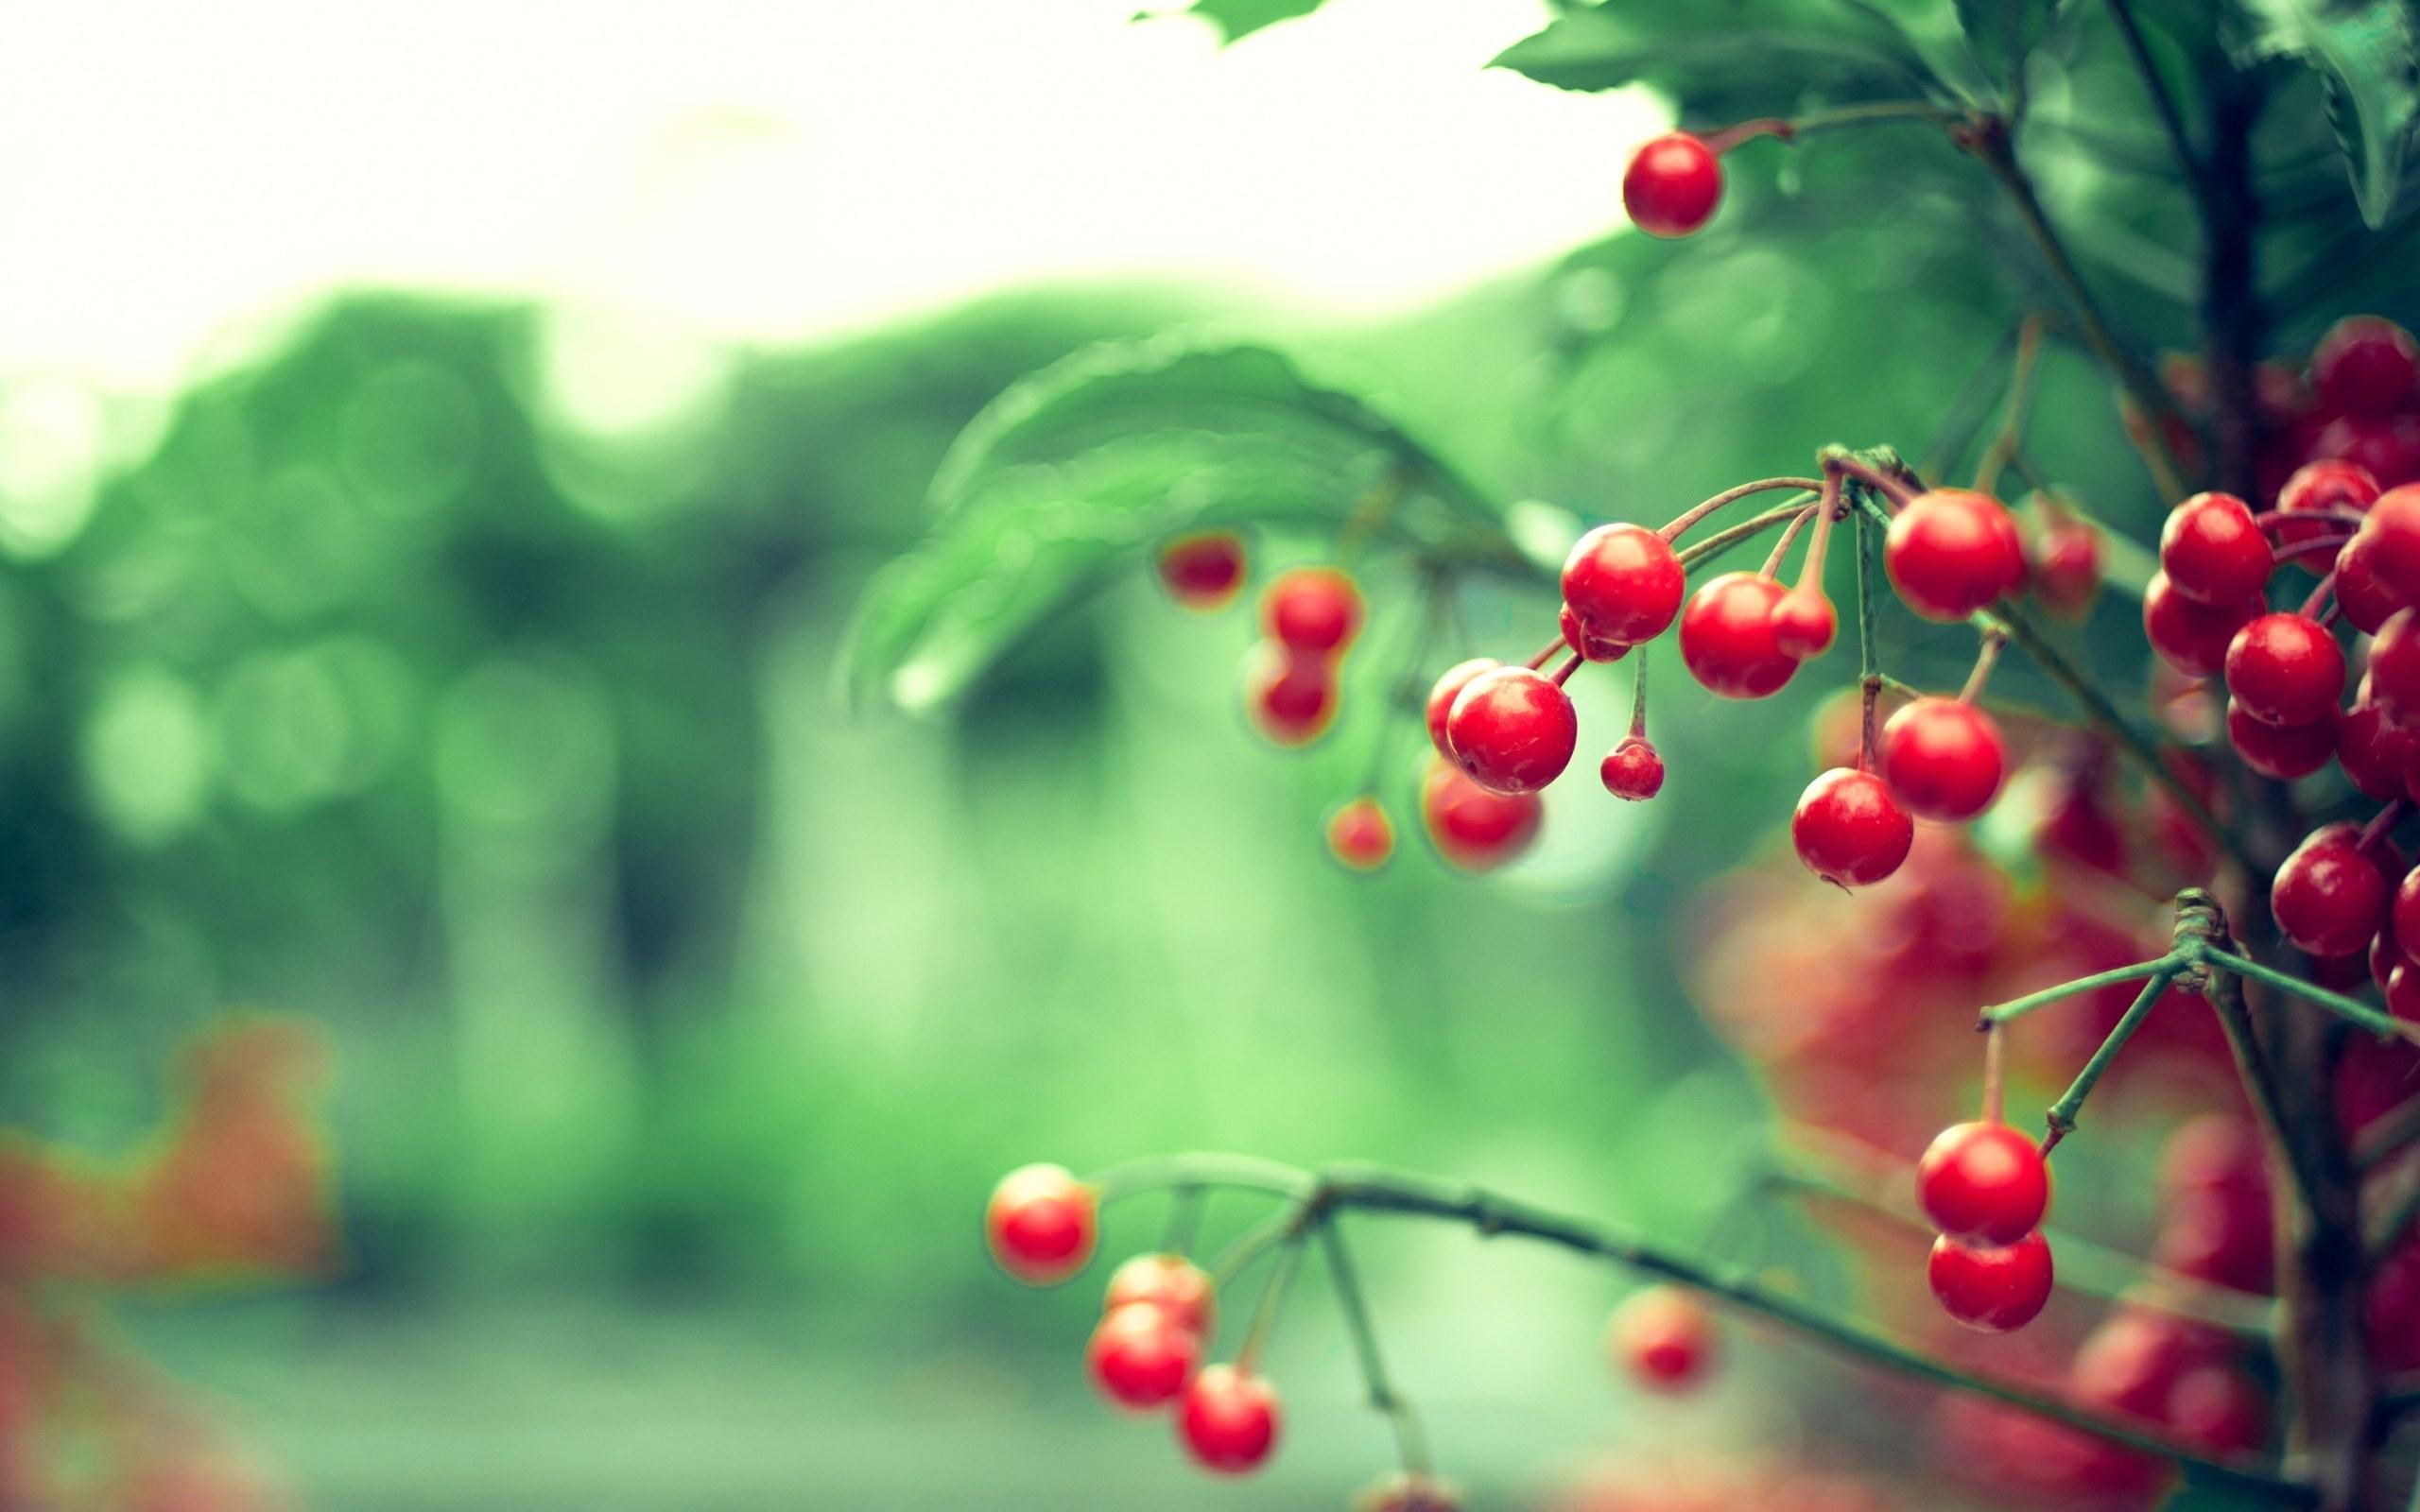 Twig Red Berries Leaves Nature Blur